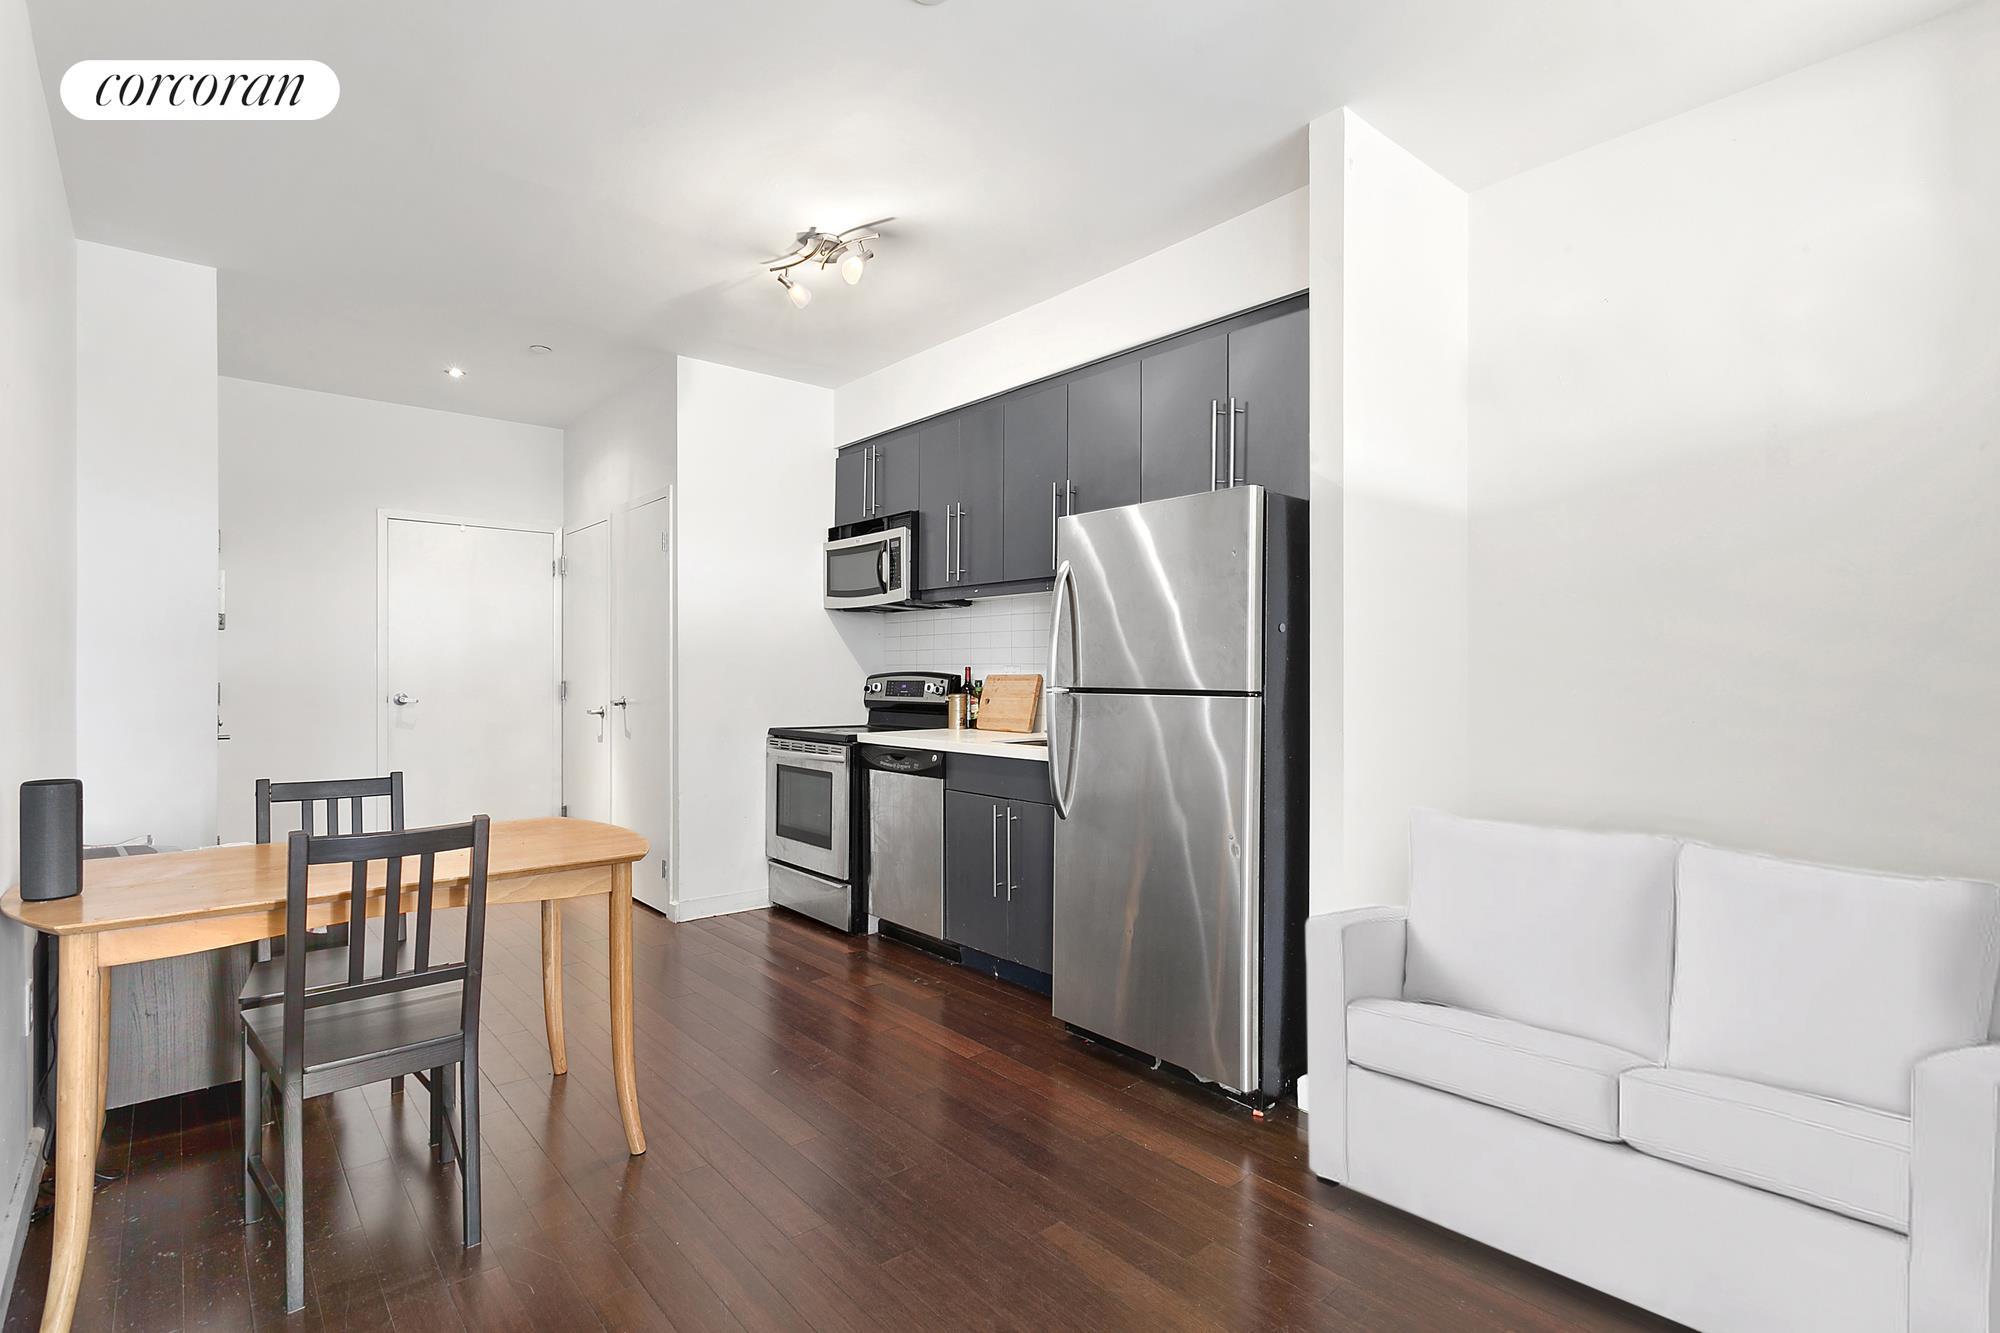 Corcoran, 38 Wilson Avenue, Apt. 2D, Bushwick Real Estate, Brooklyn ...